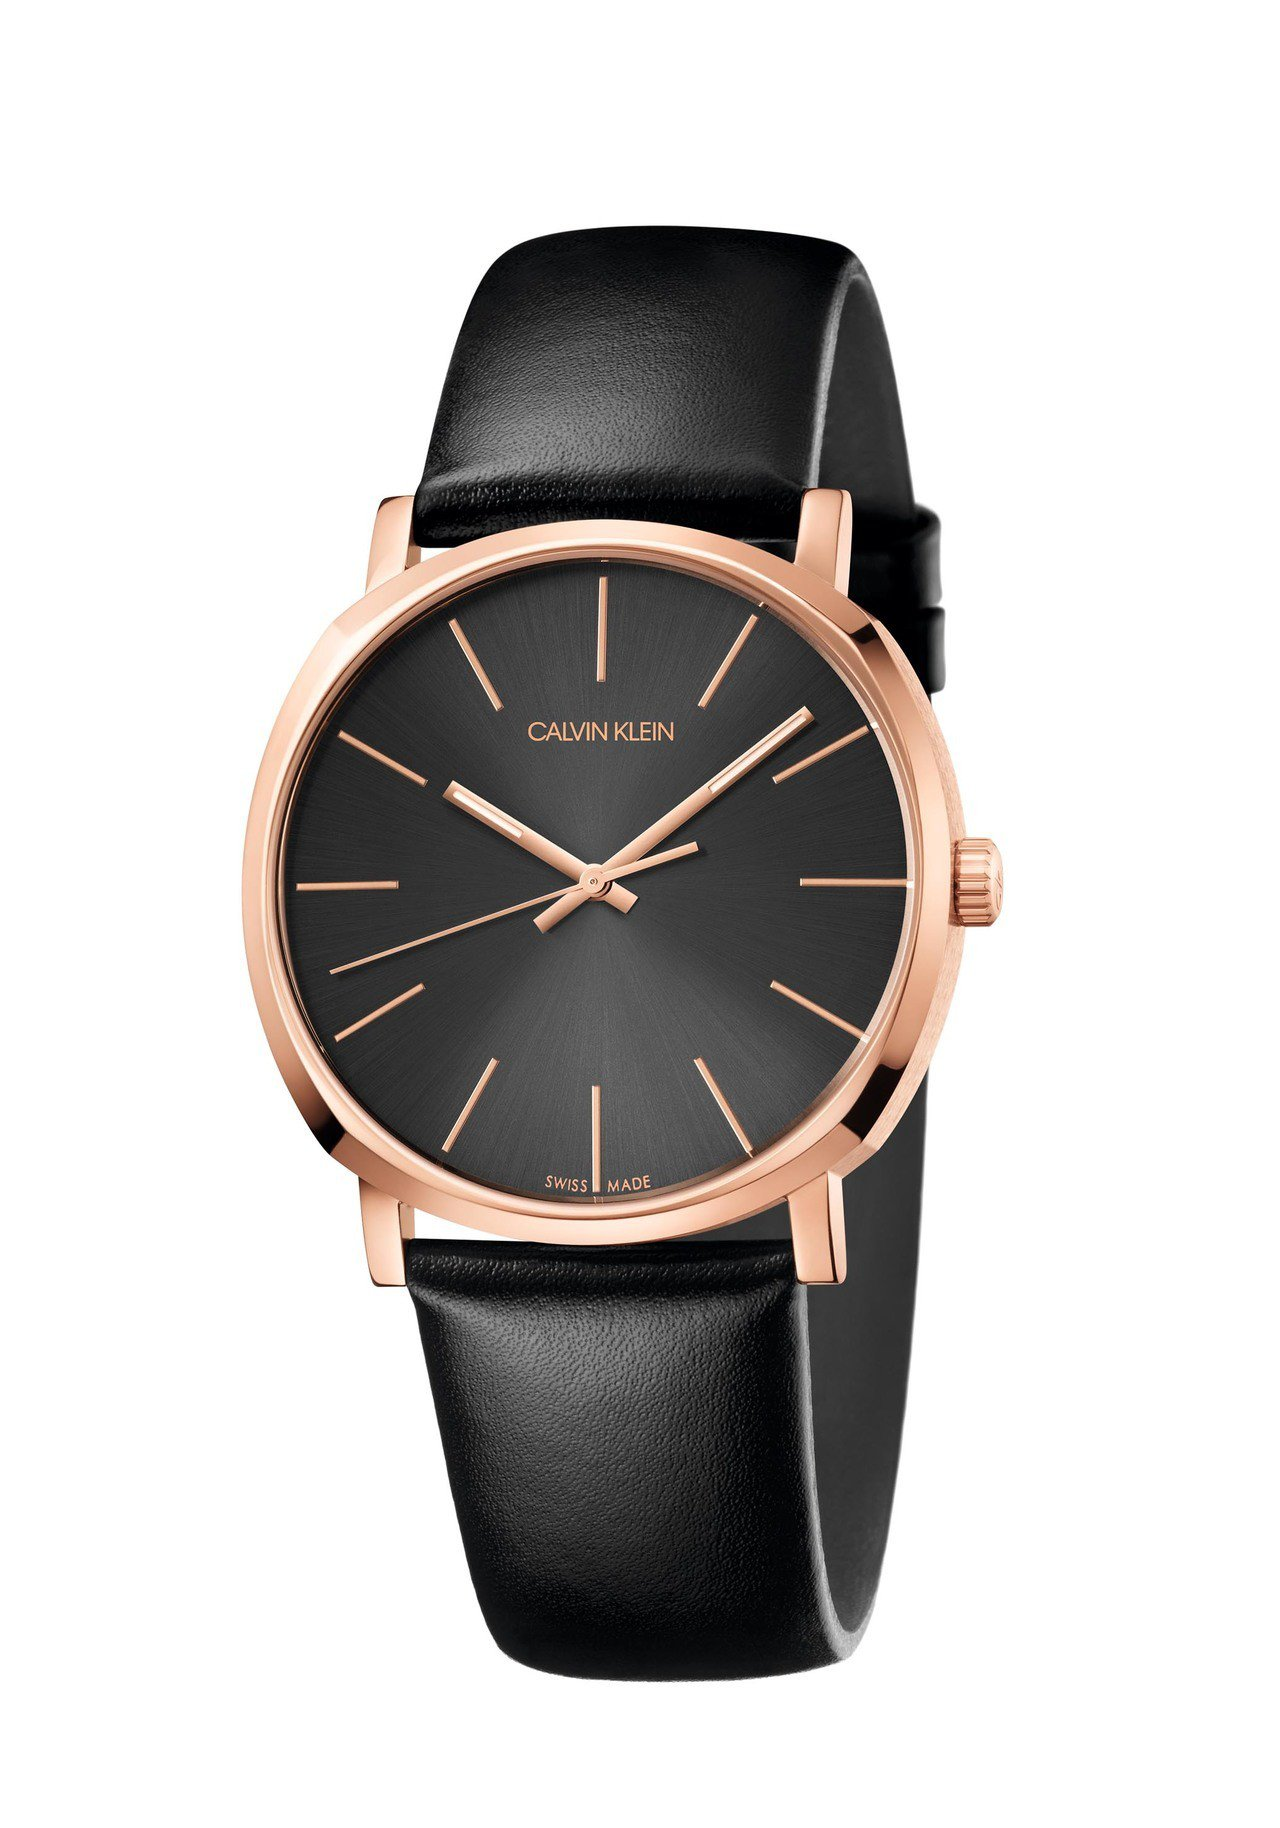 CALVIN KLEIN Posh潮流系列腕表,玫瑰金PVD不鏽鋼表殼,搭配黑色...